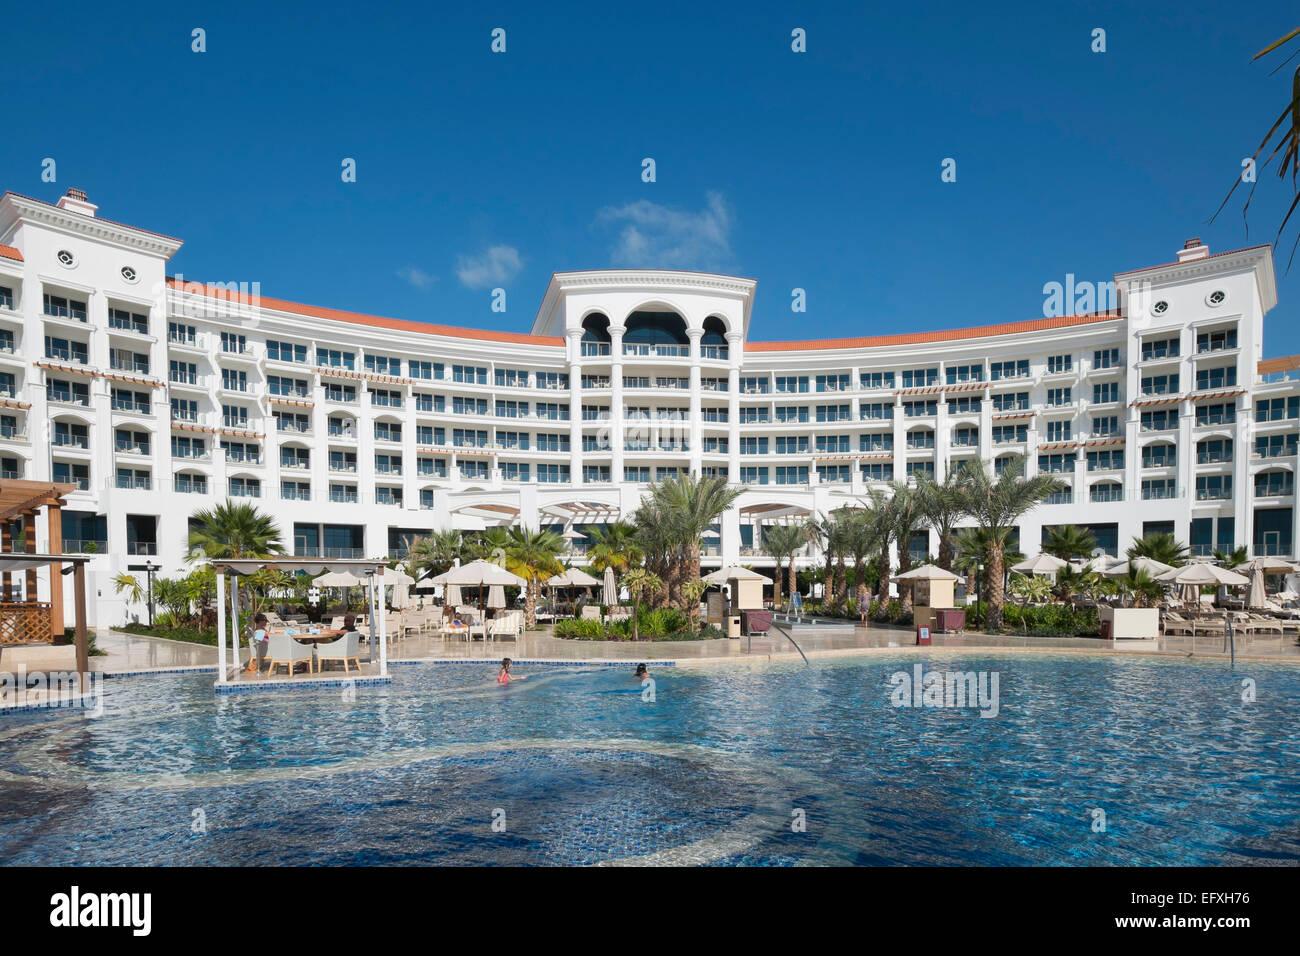 Waldorf astoria hotel on the palm jumeirah island in dubai for Astoria hotel dubai